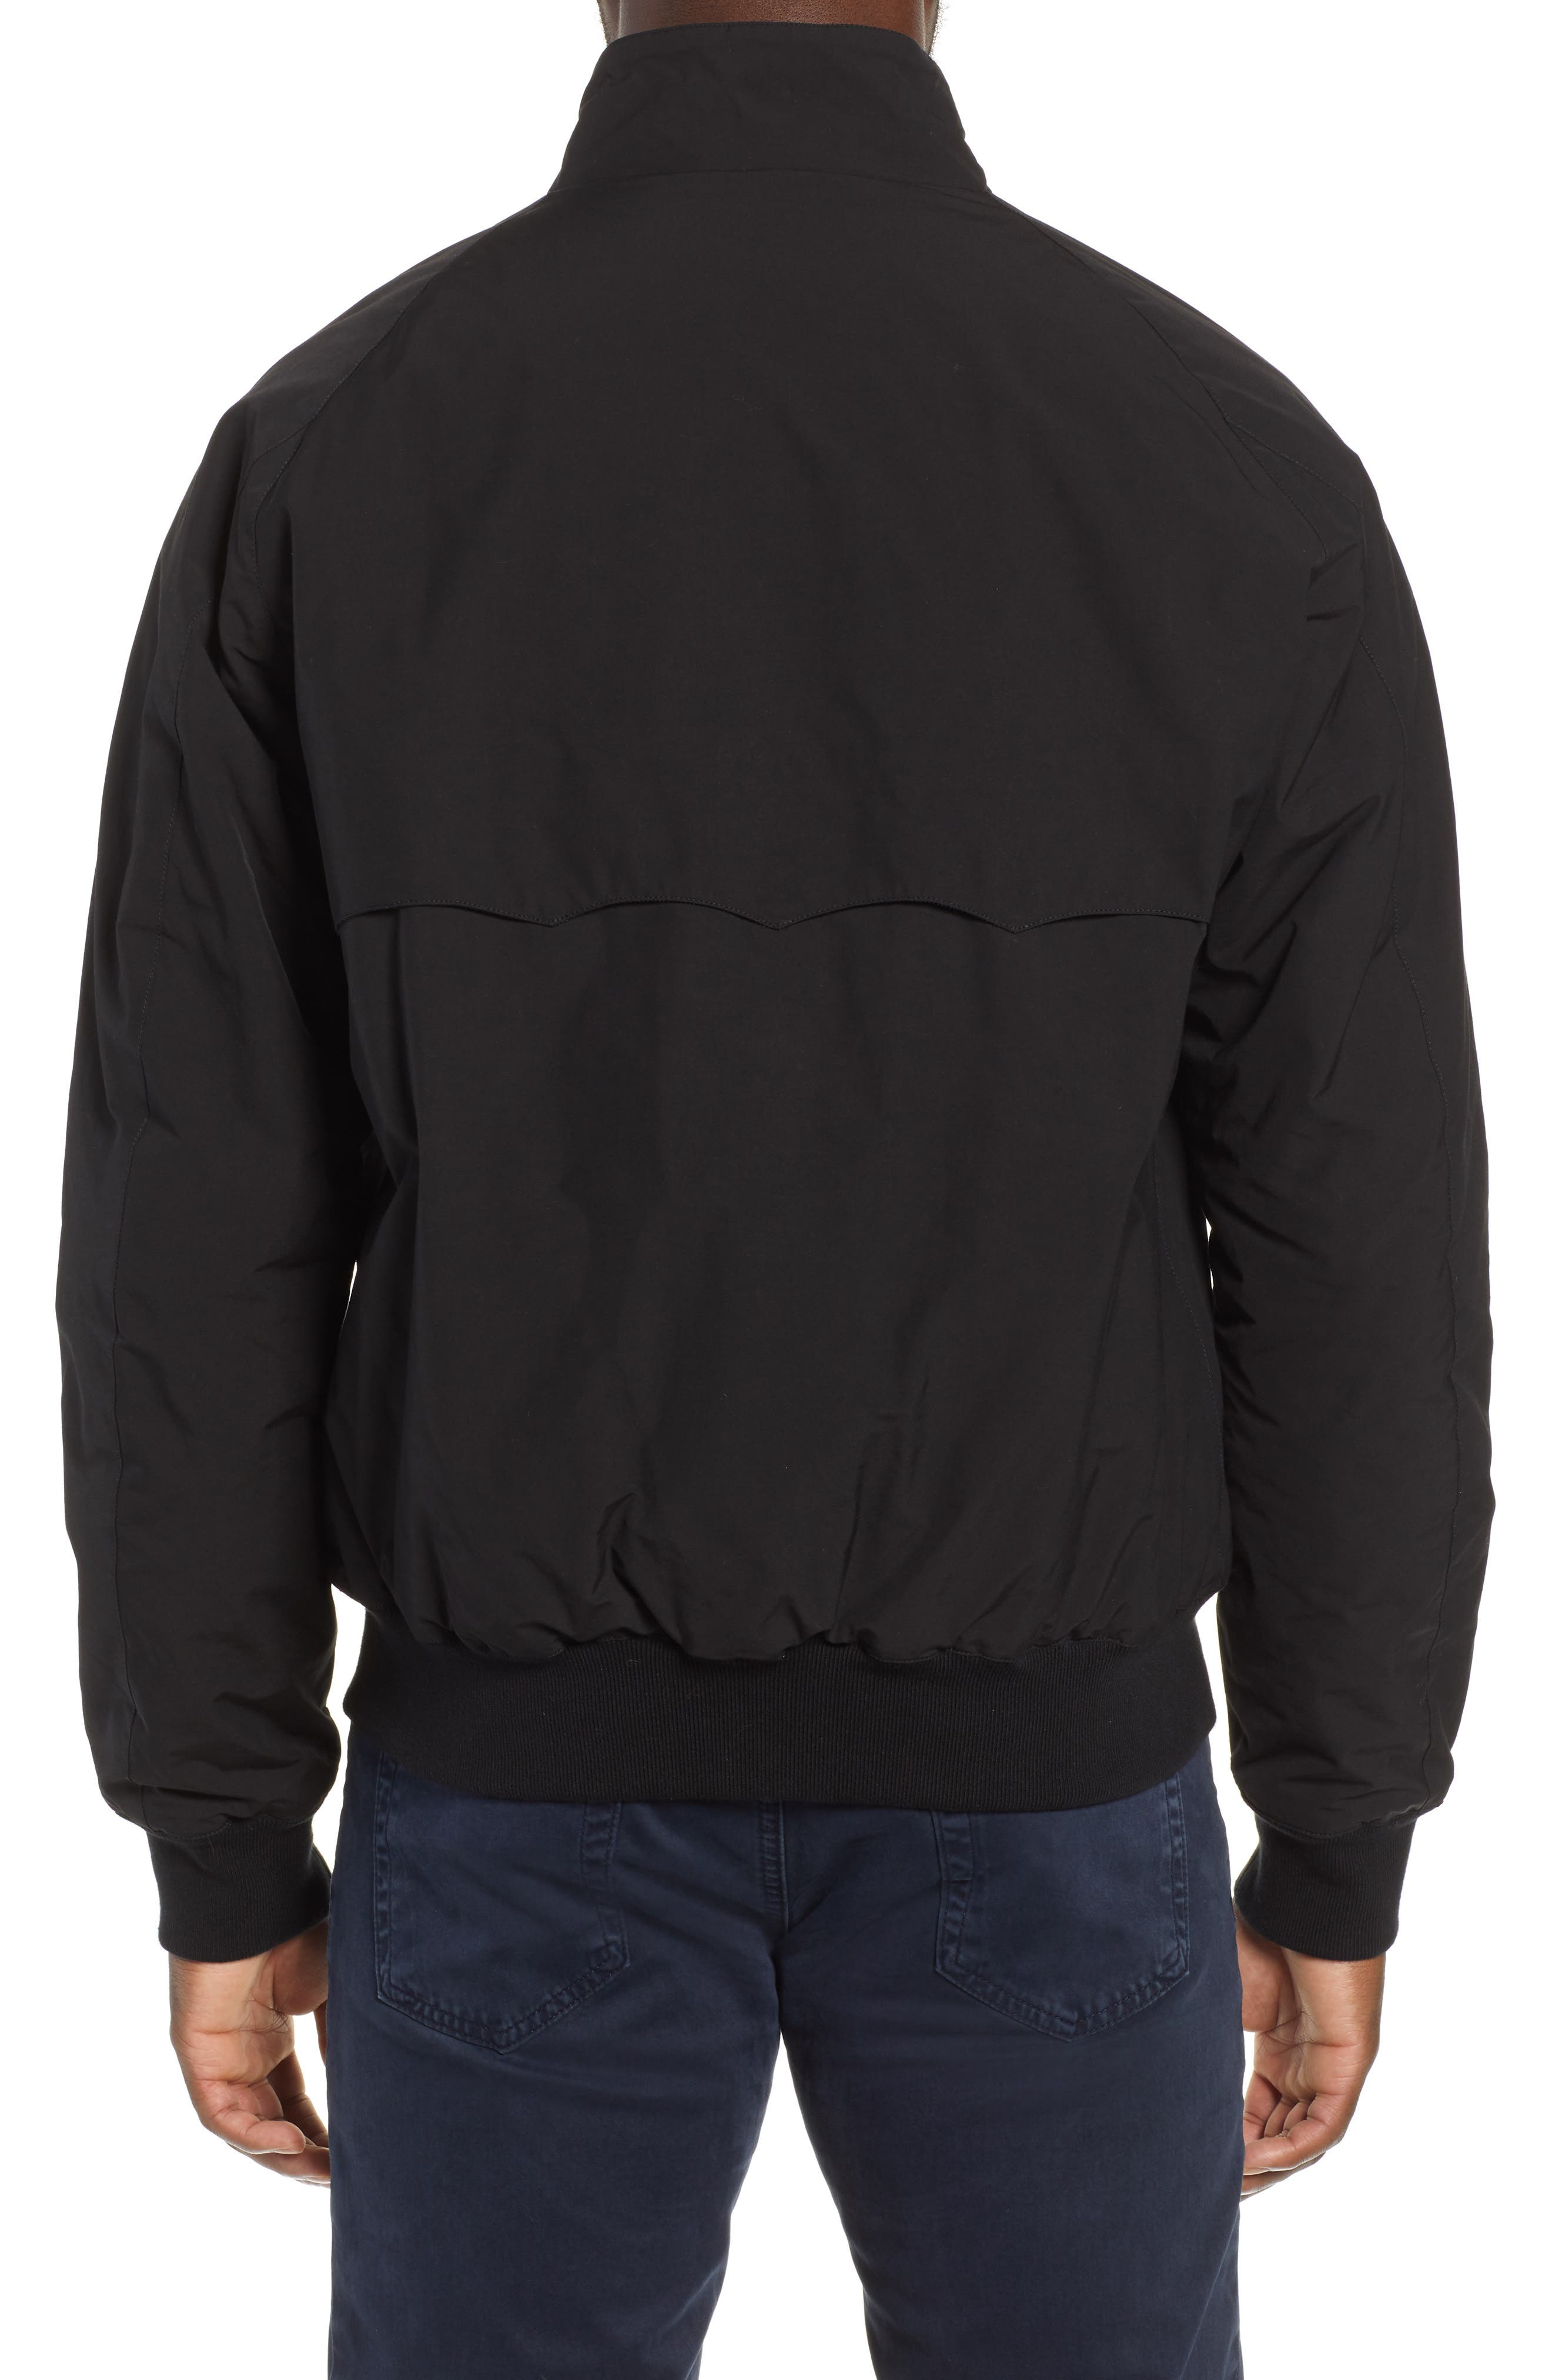 G9 Water Resistant Harrington Jacket,                             Alternate thumbnail 2, color,                             BLACK